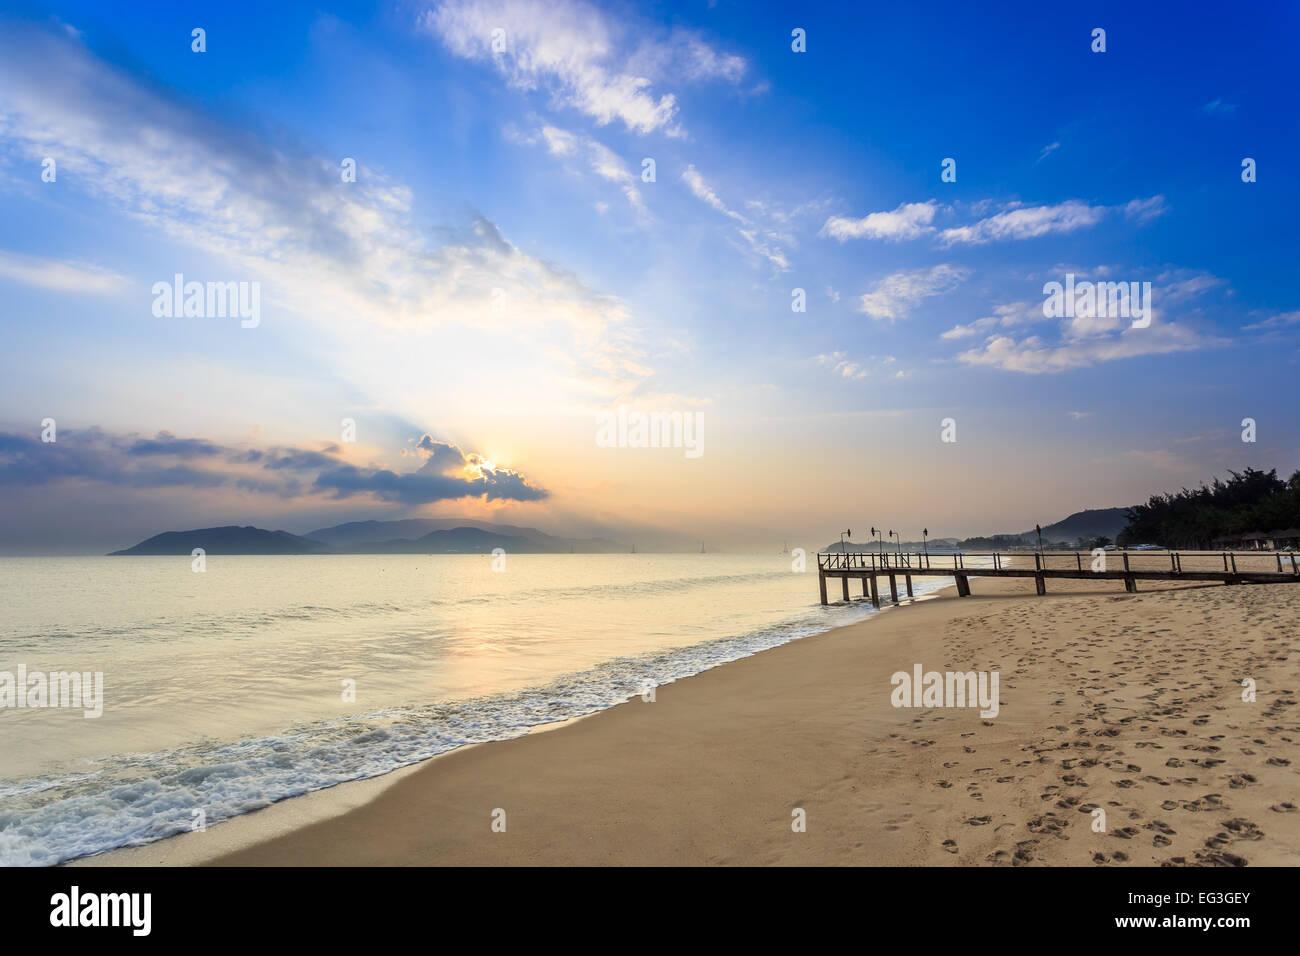 Nha Trang City Beach, Vietnam. Early Morning - Stock Image